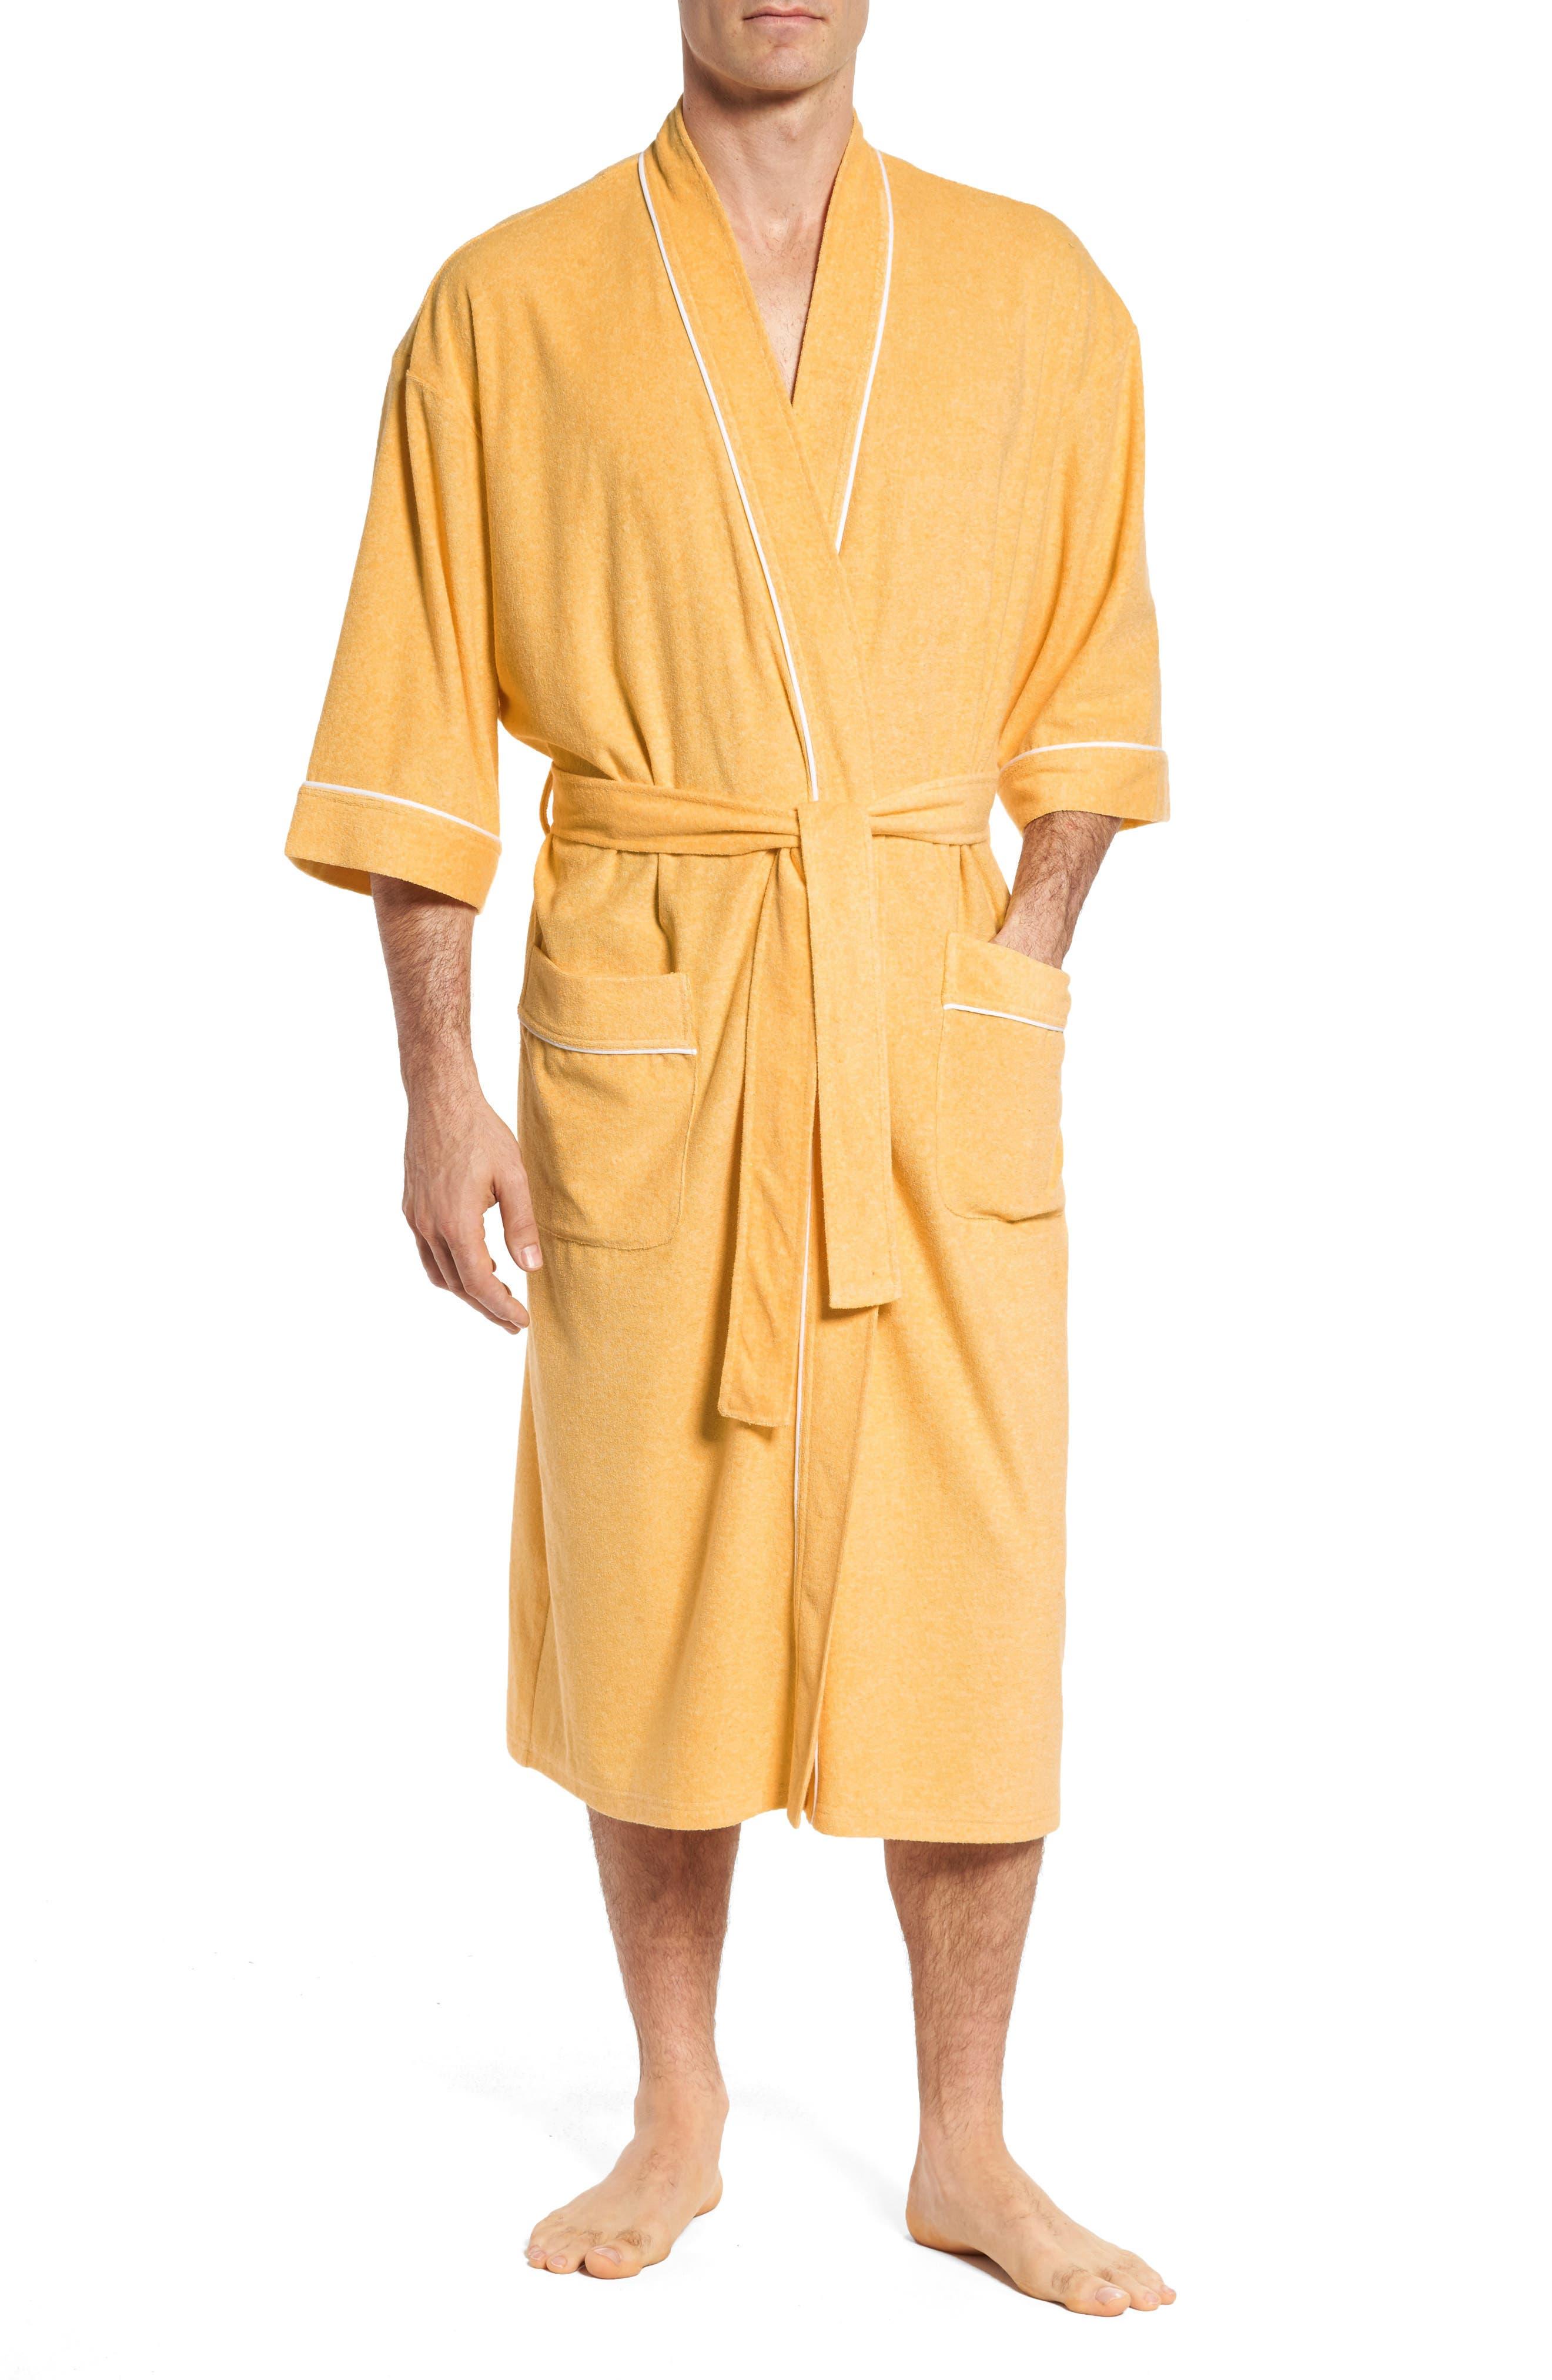 Kimono Cotton Blend Robe,                         Main,                         color, 700